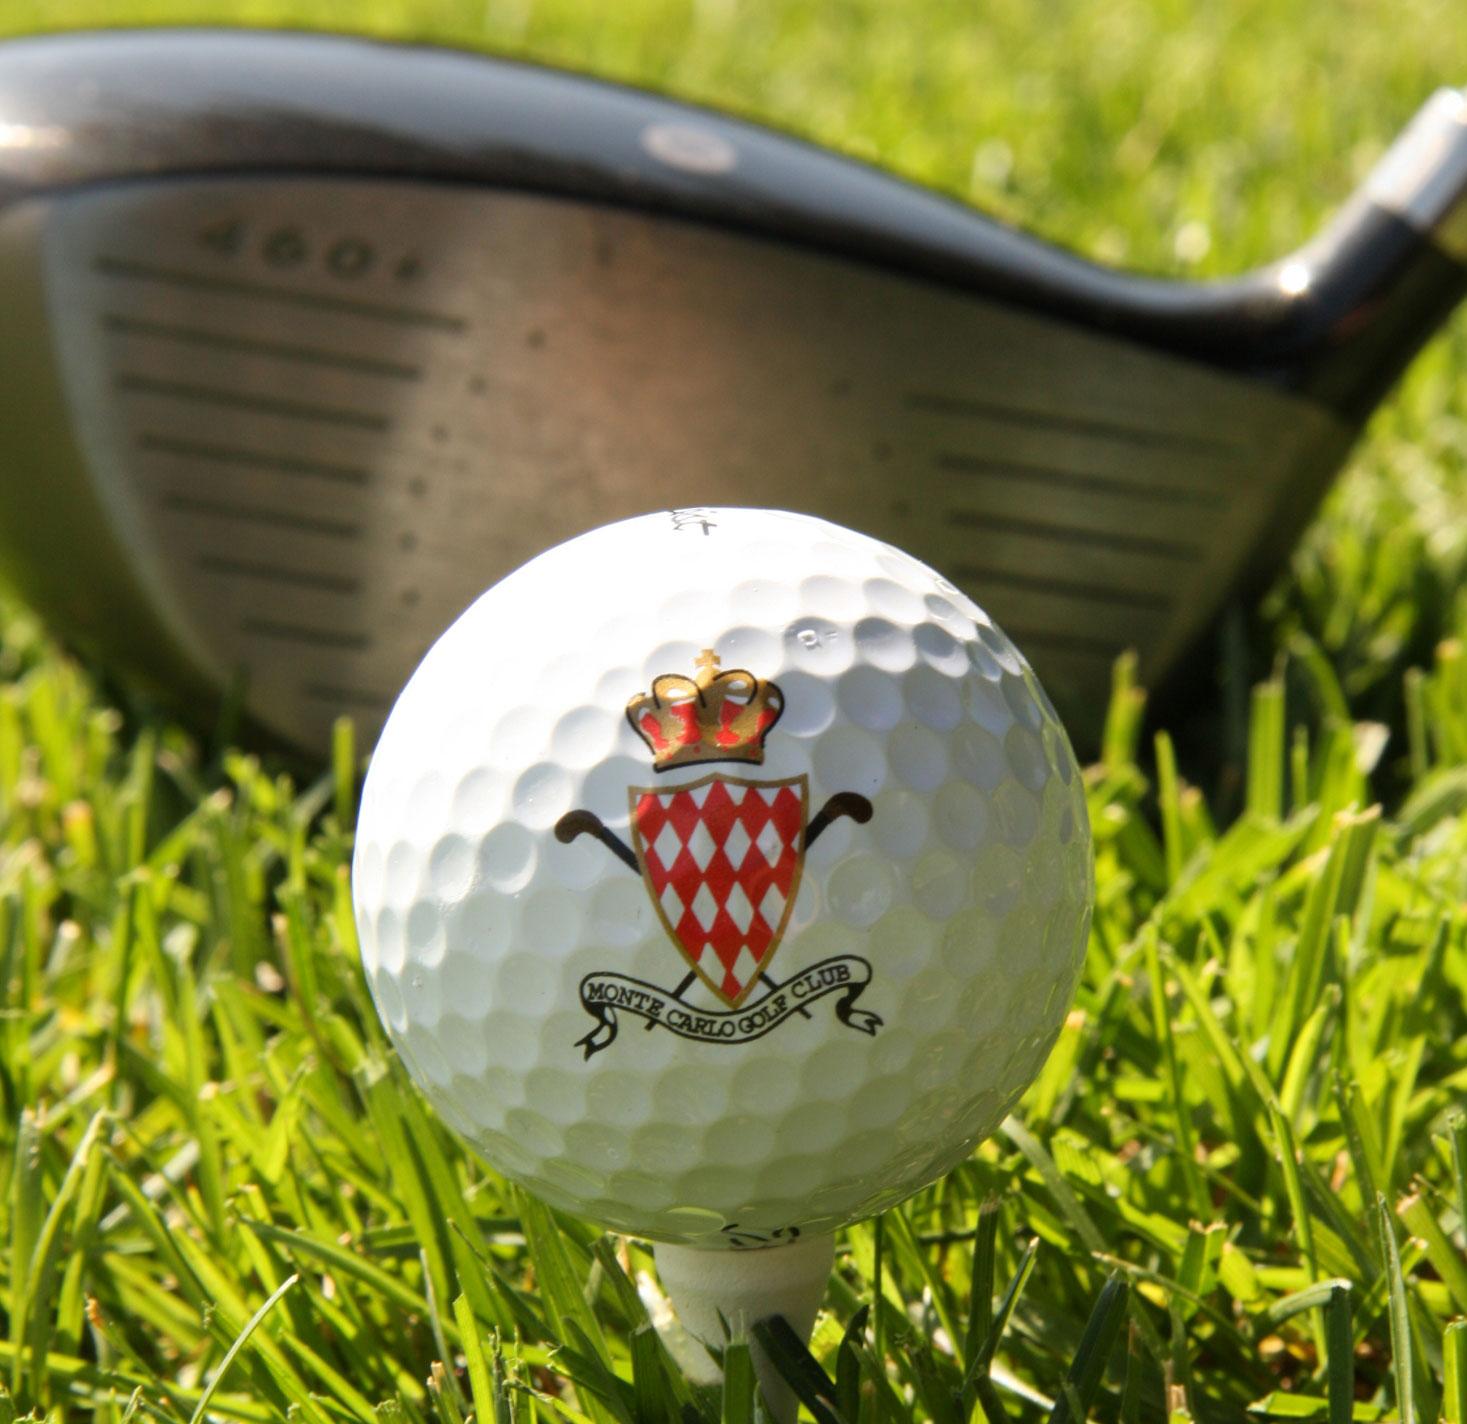 Golf-Monte-carlo-Monaco-club-house-18-trous-parcours-green-practice-sport-loisirs-cote-azur-mer-1